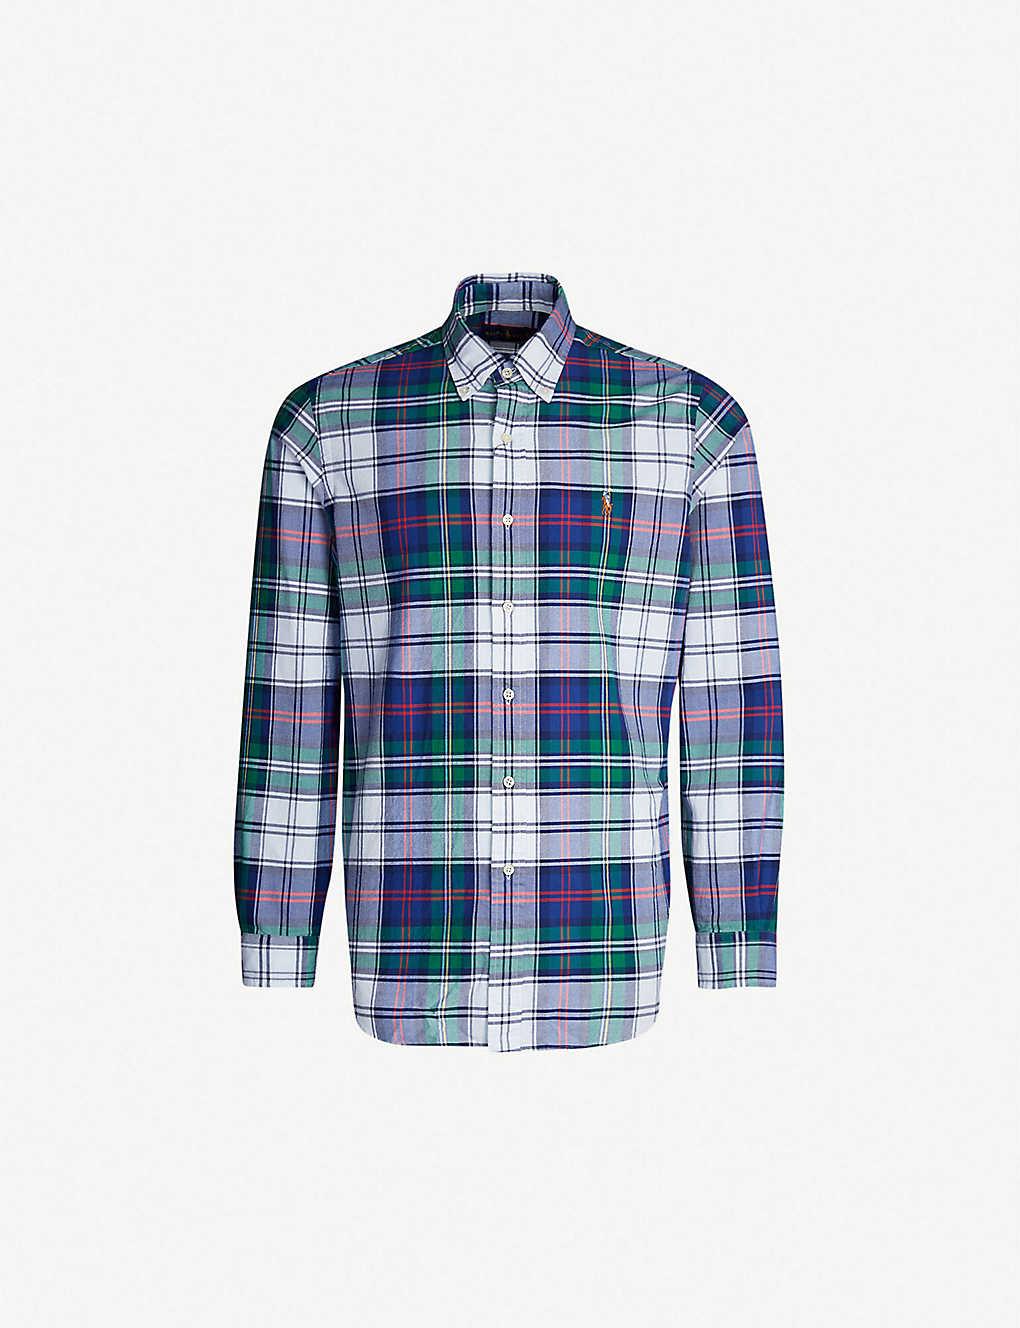 921275b4 POLO RALPH LAUREN - Checked slim-fit cotton shirt | Selfridges.com